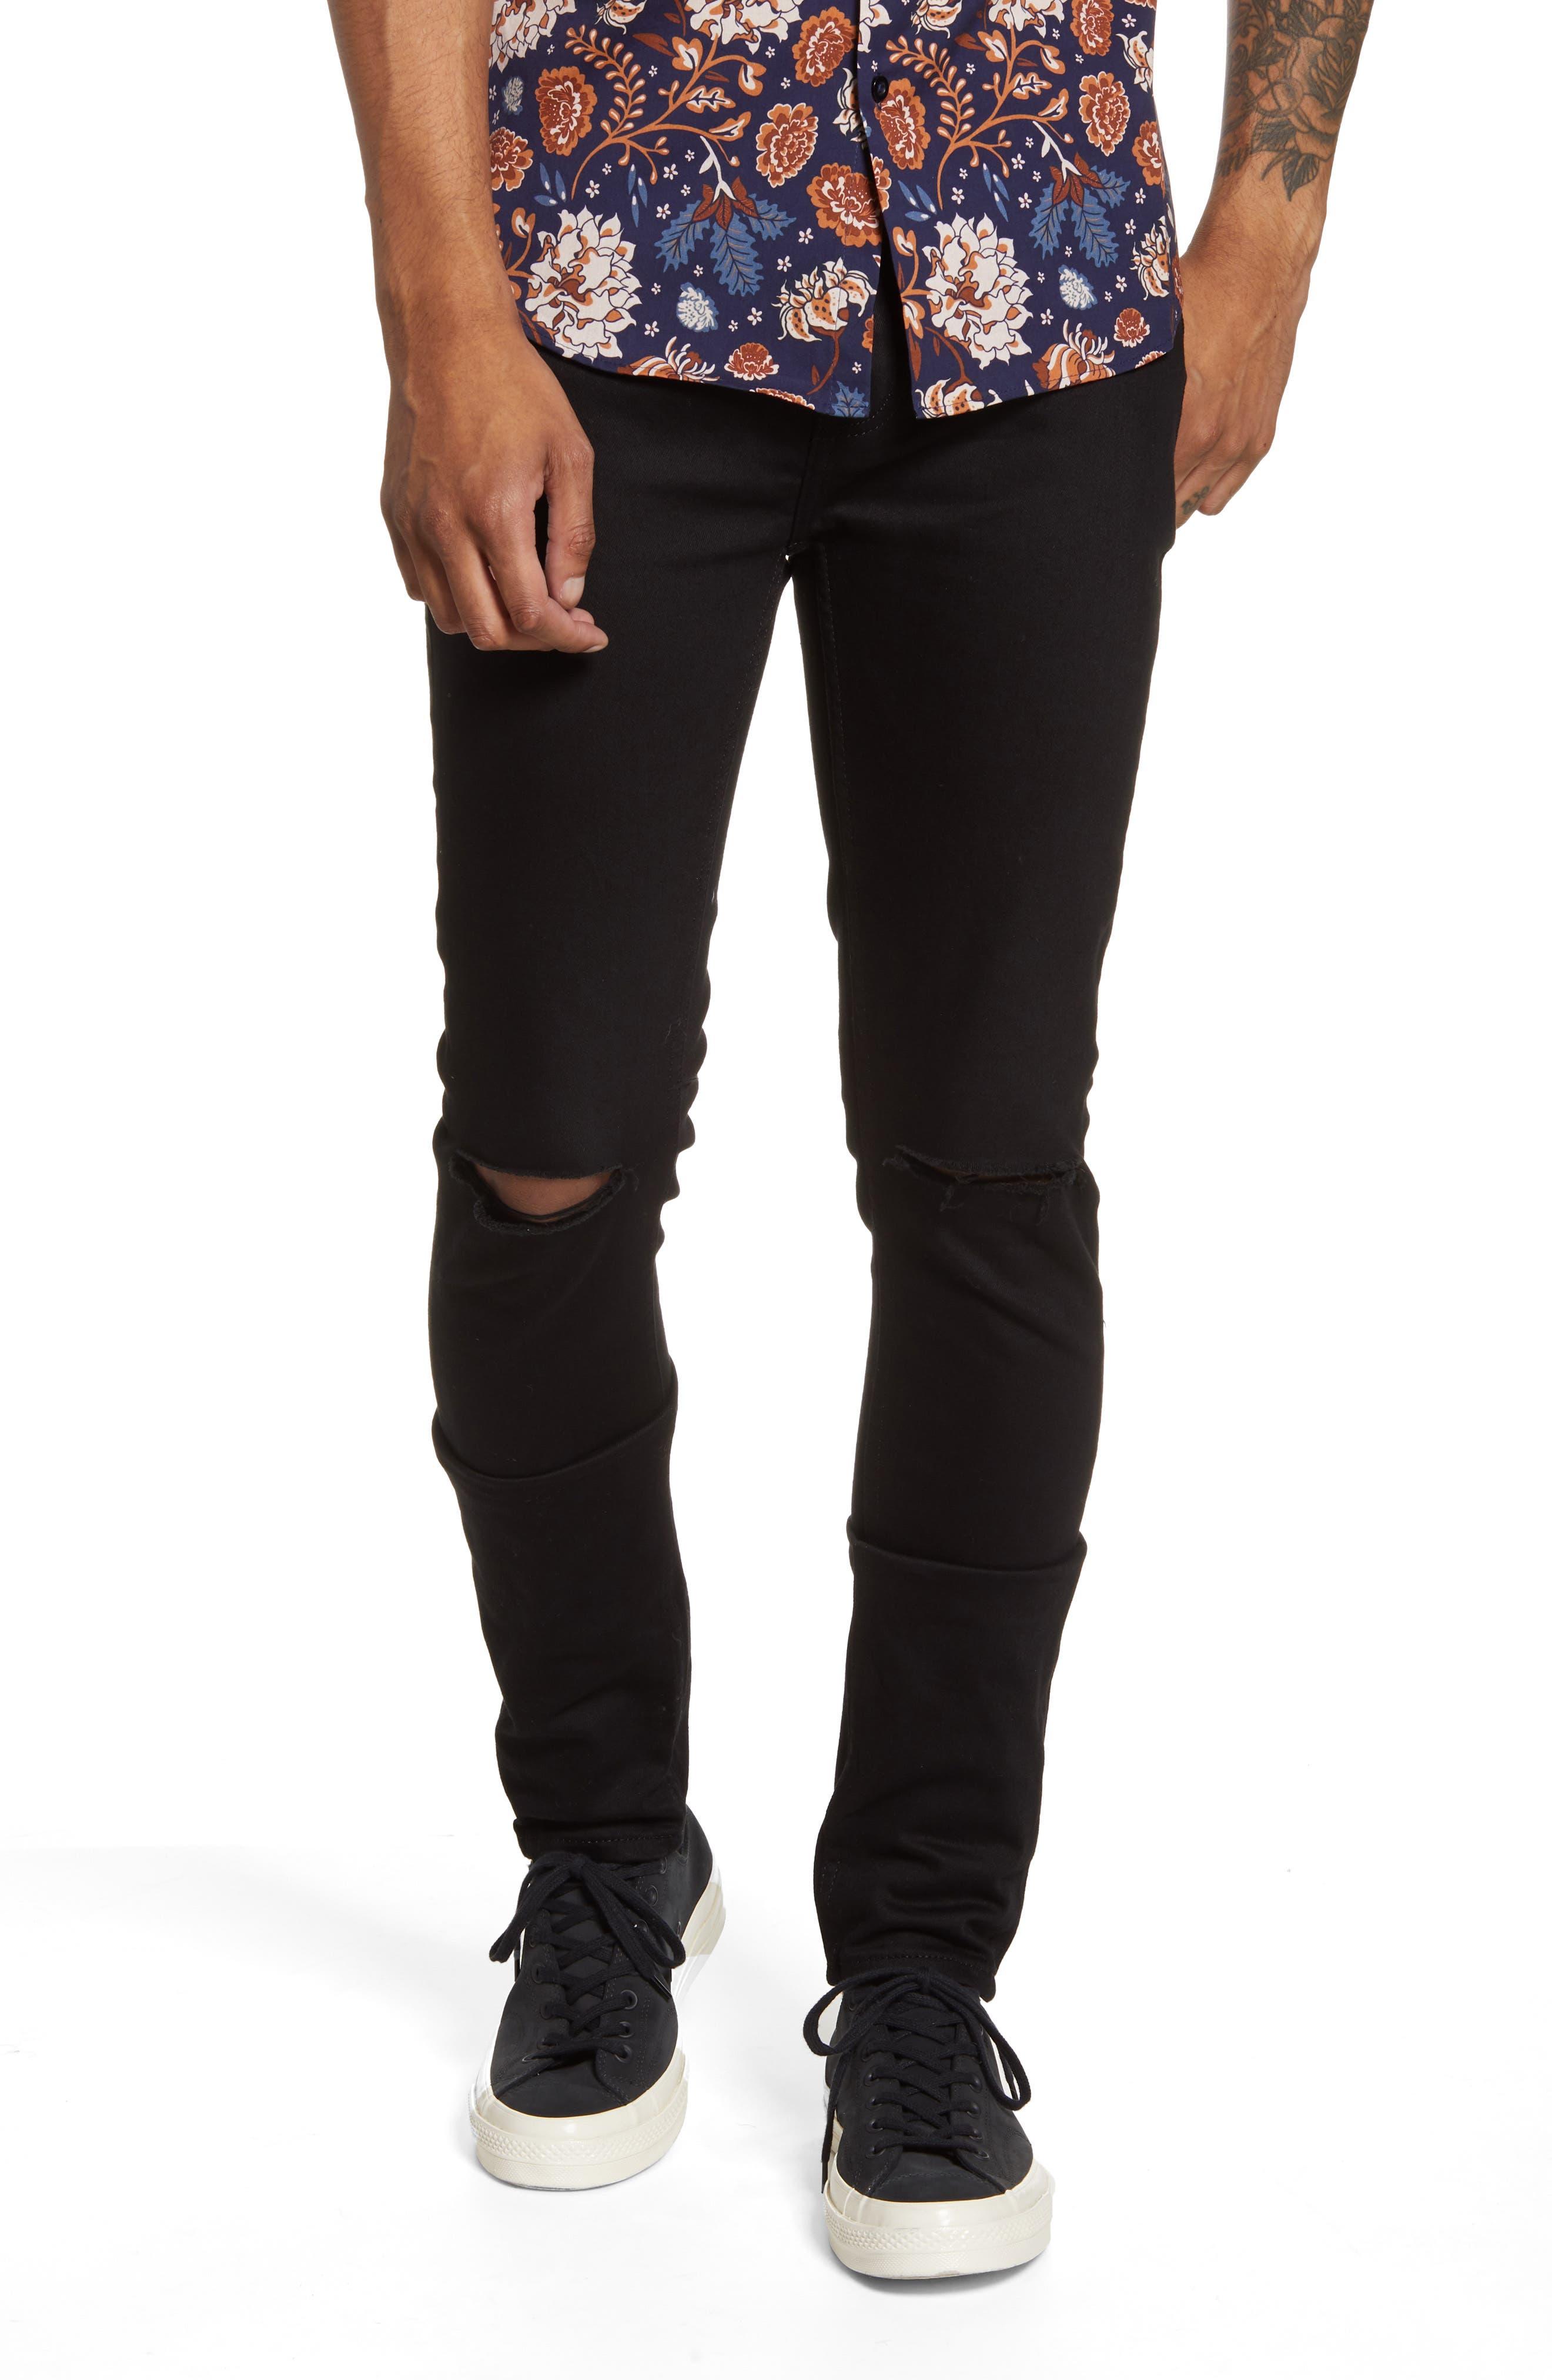 Men's Topman Ripped Skinny Jeans,  32 x 34 - Black